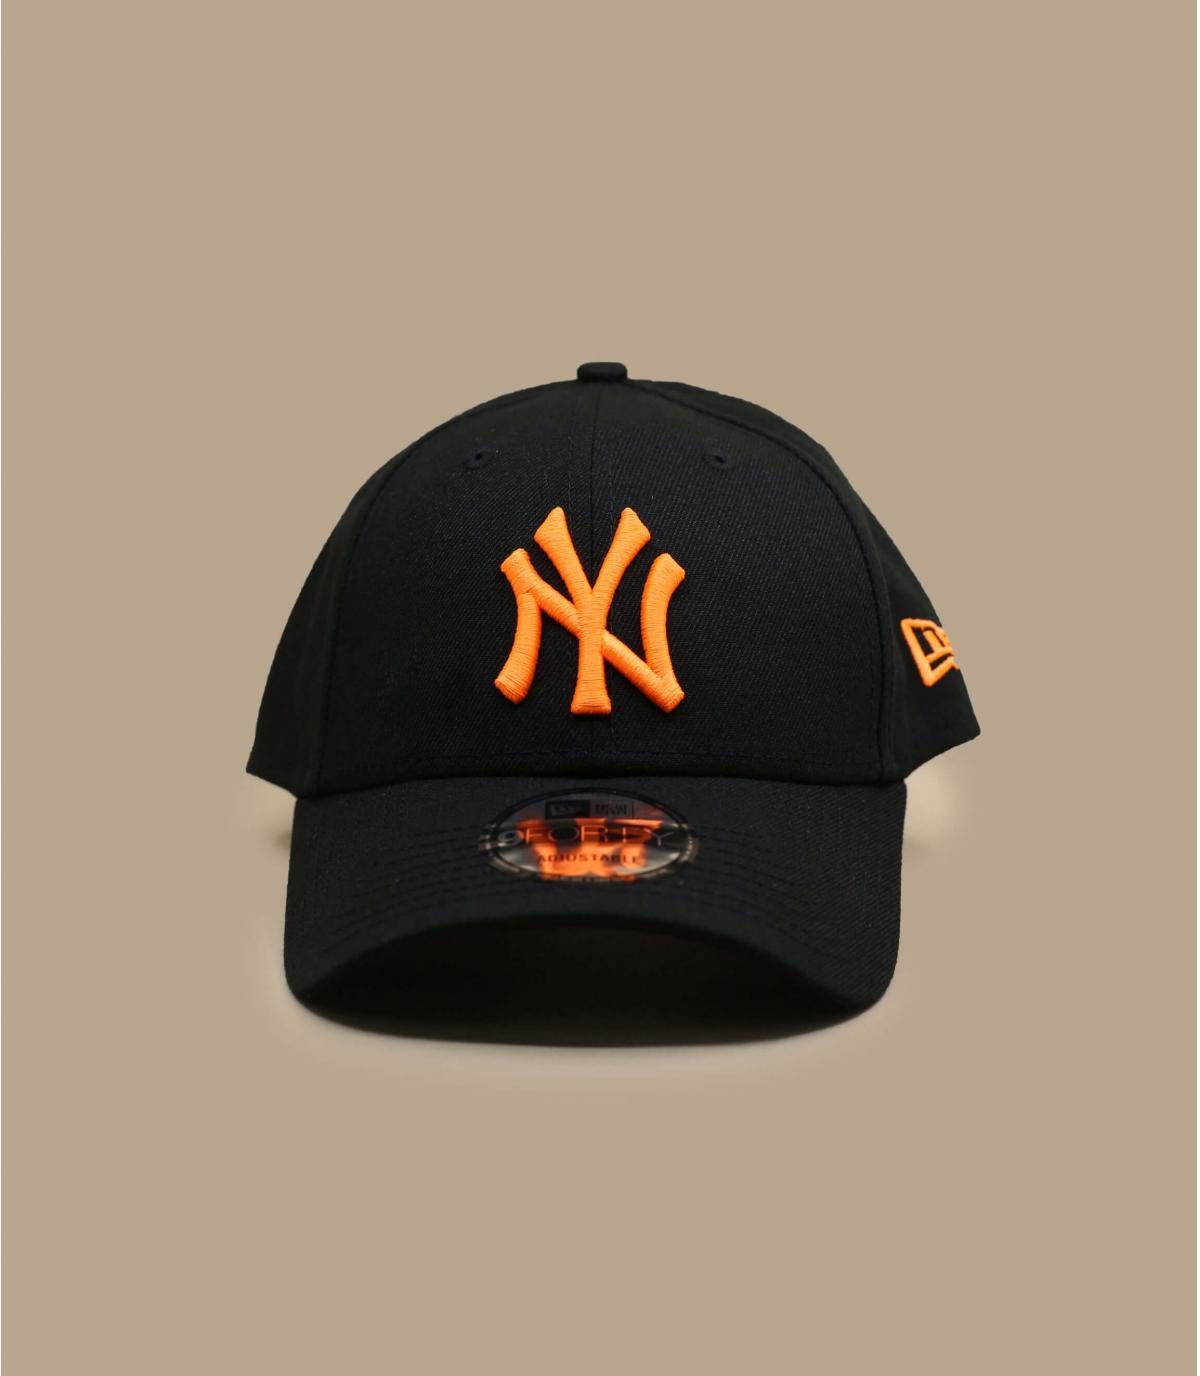 black fluorescent orange NY cap